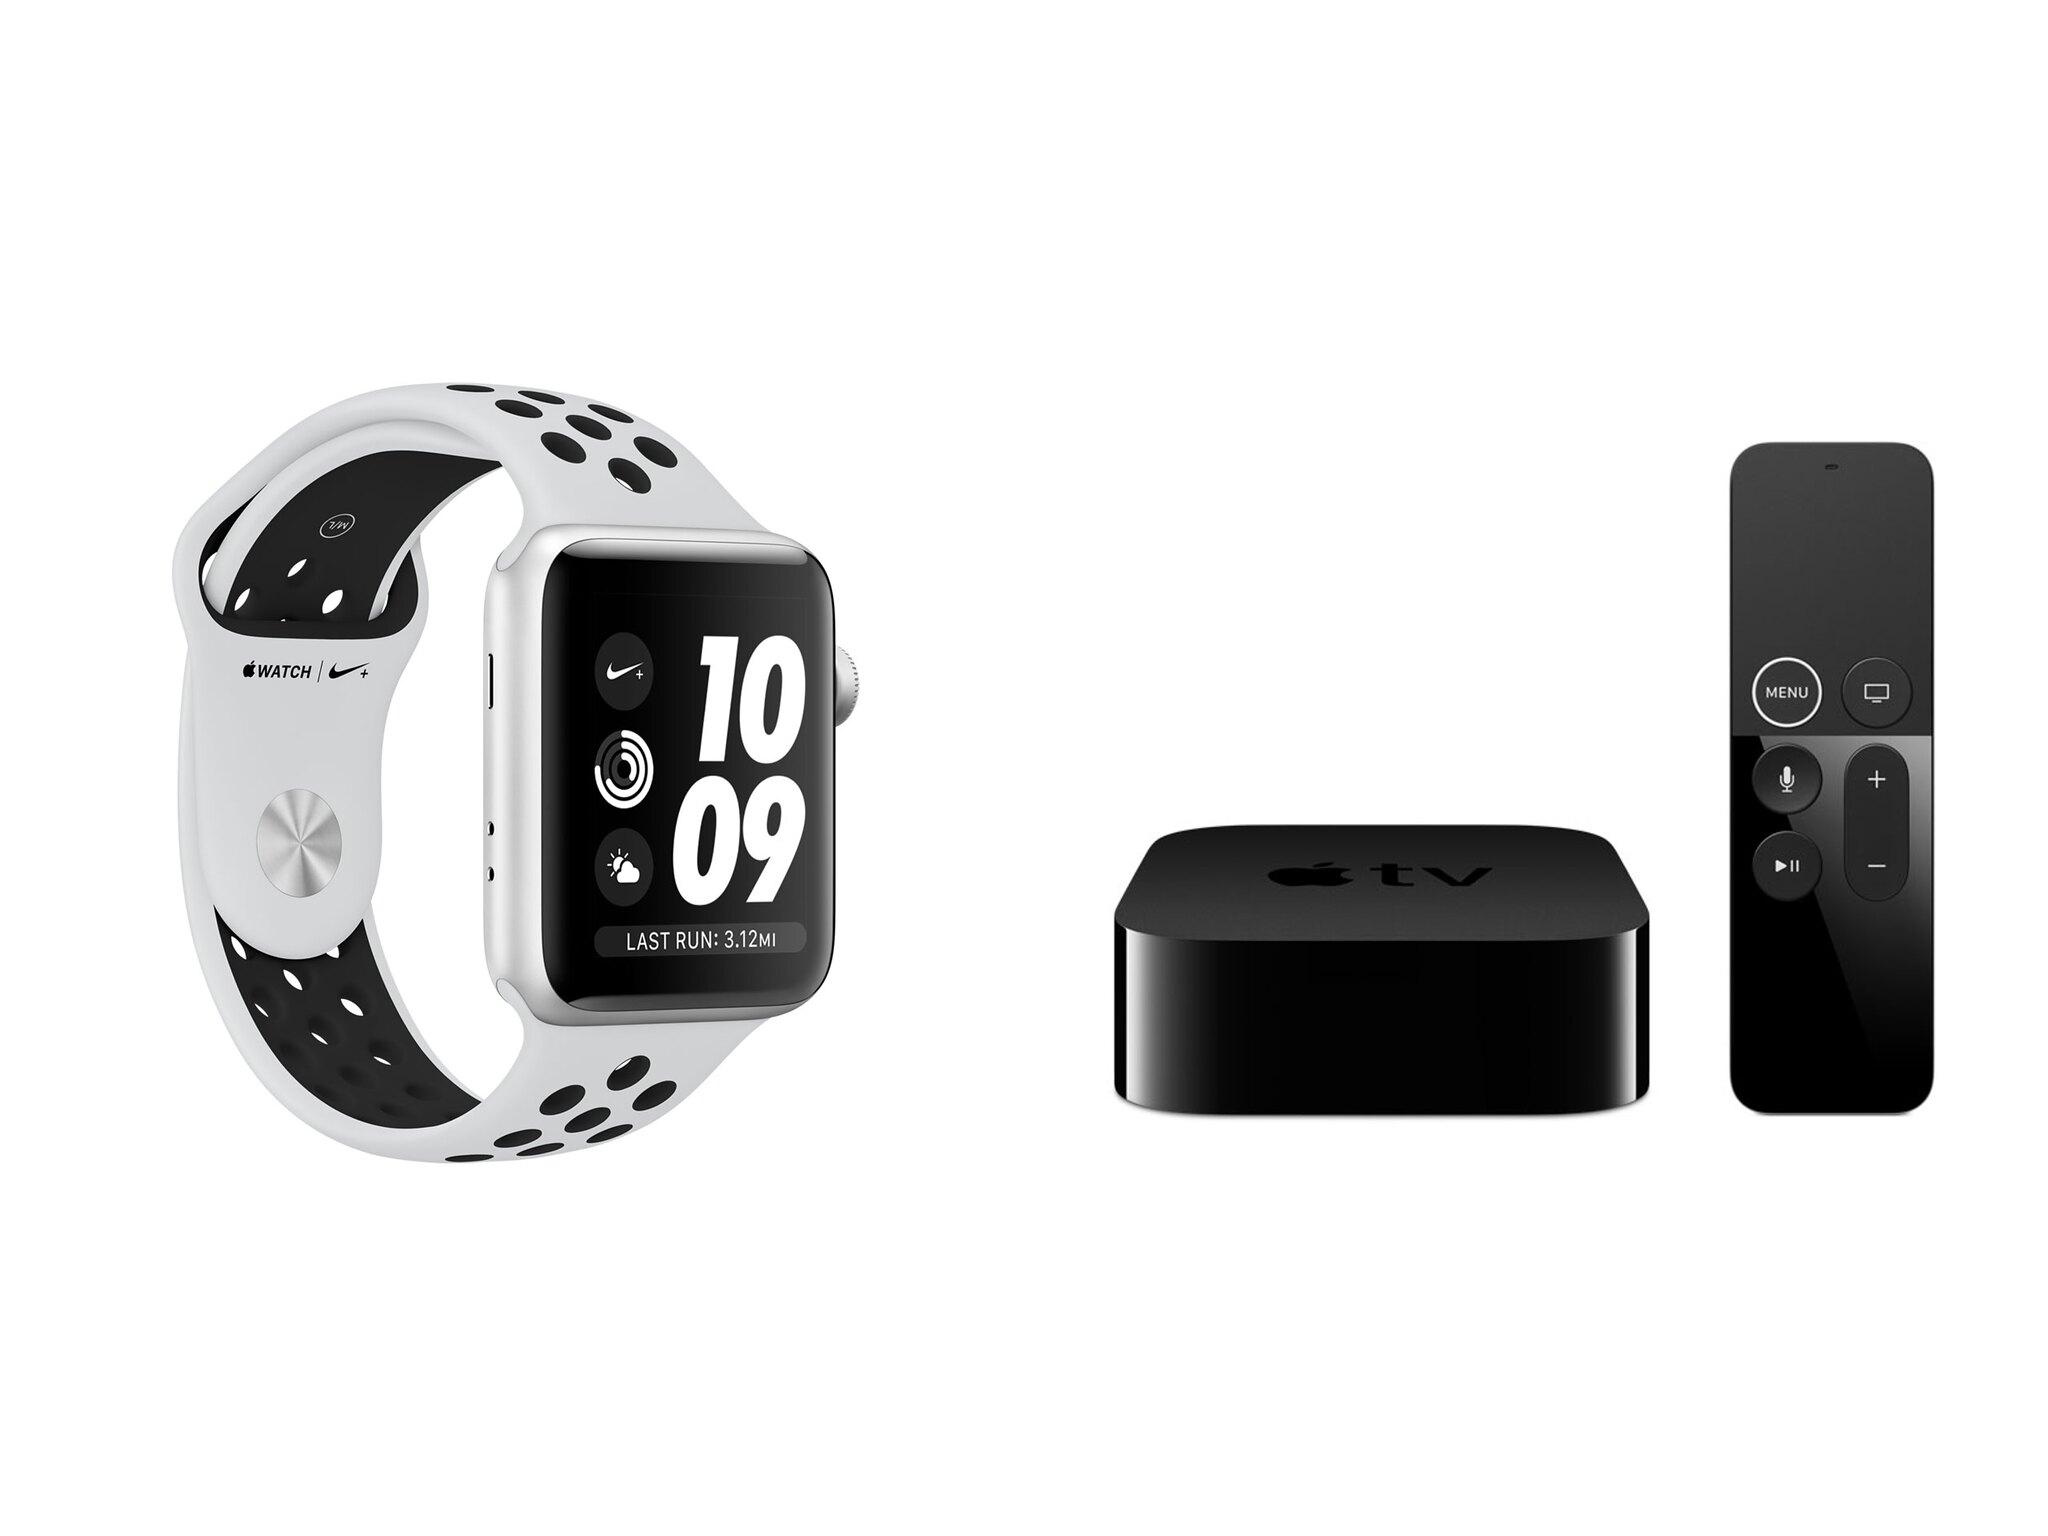 Apple Watch AppleTV